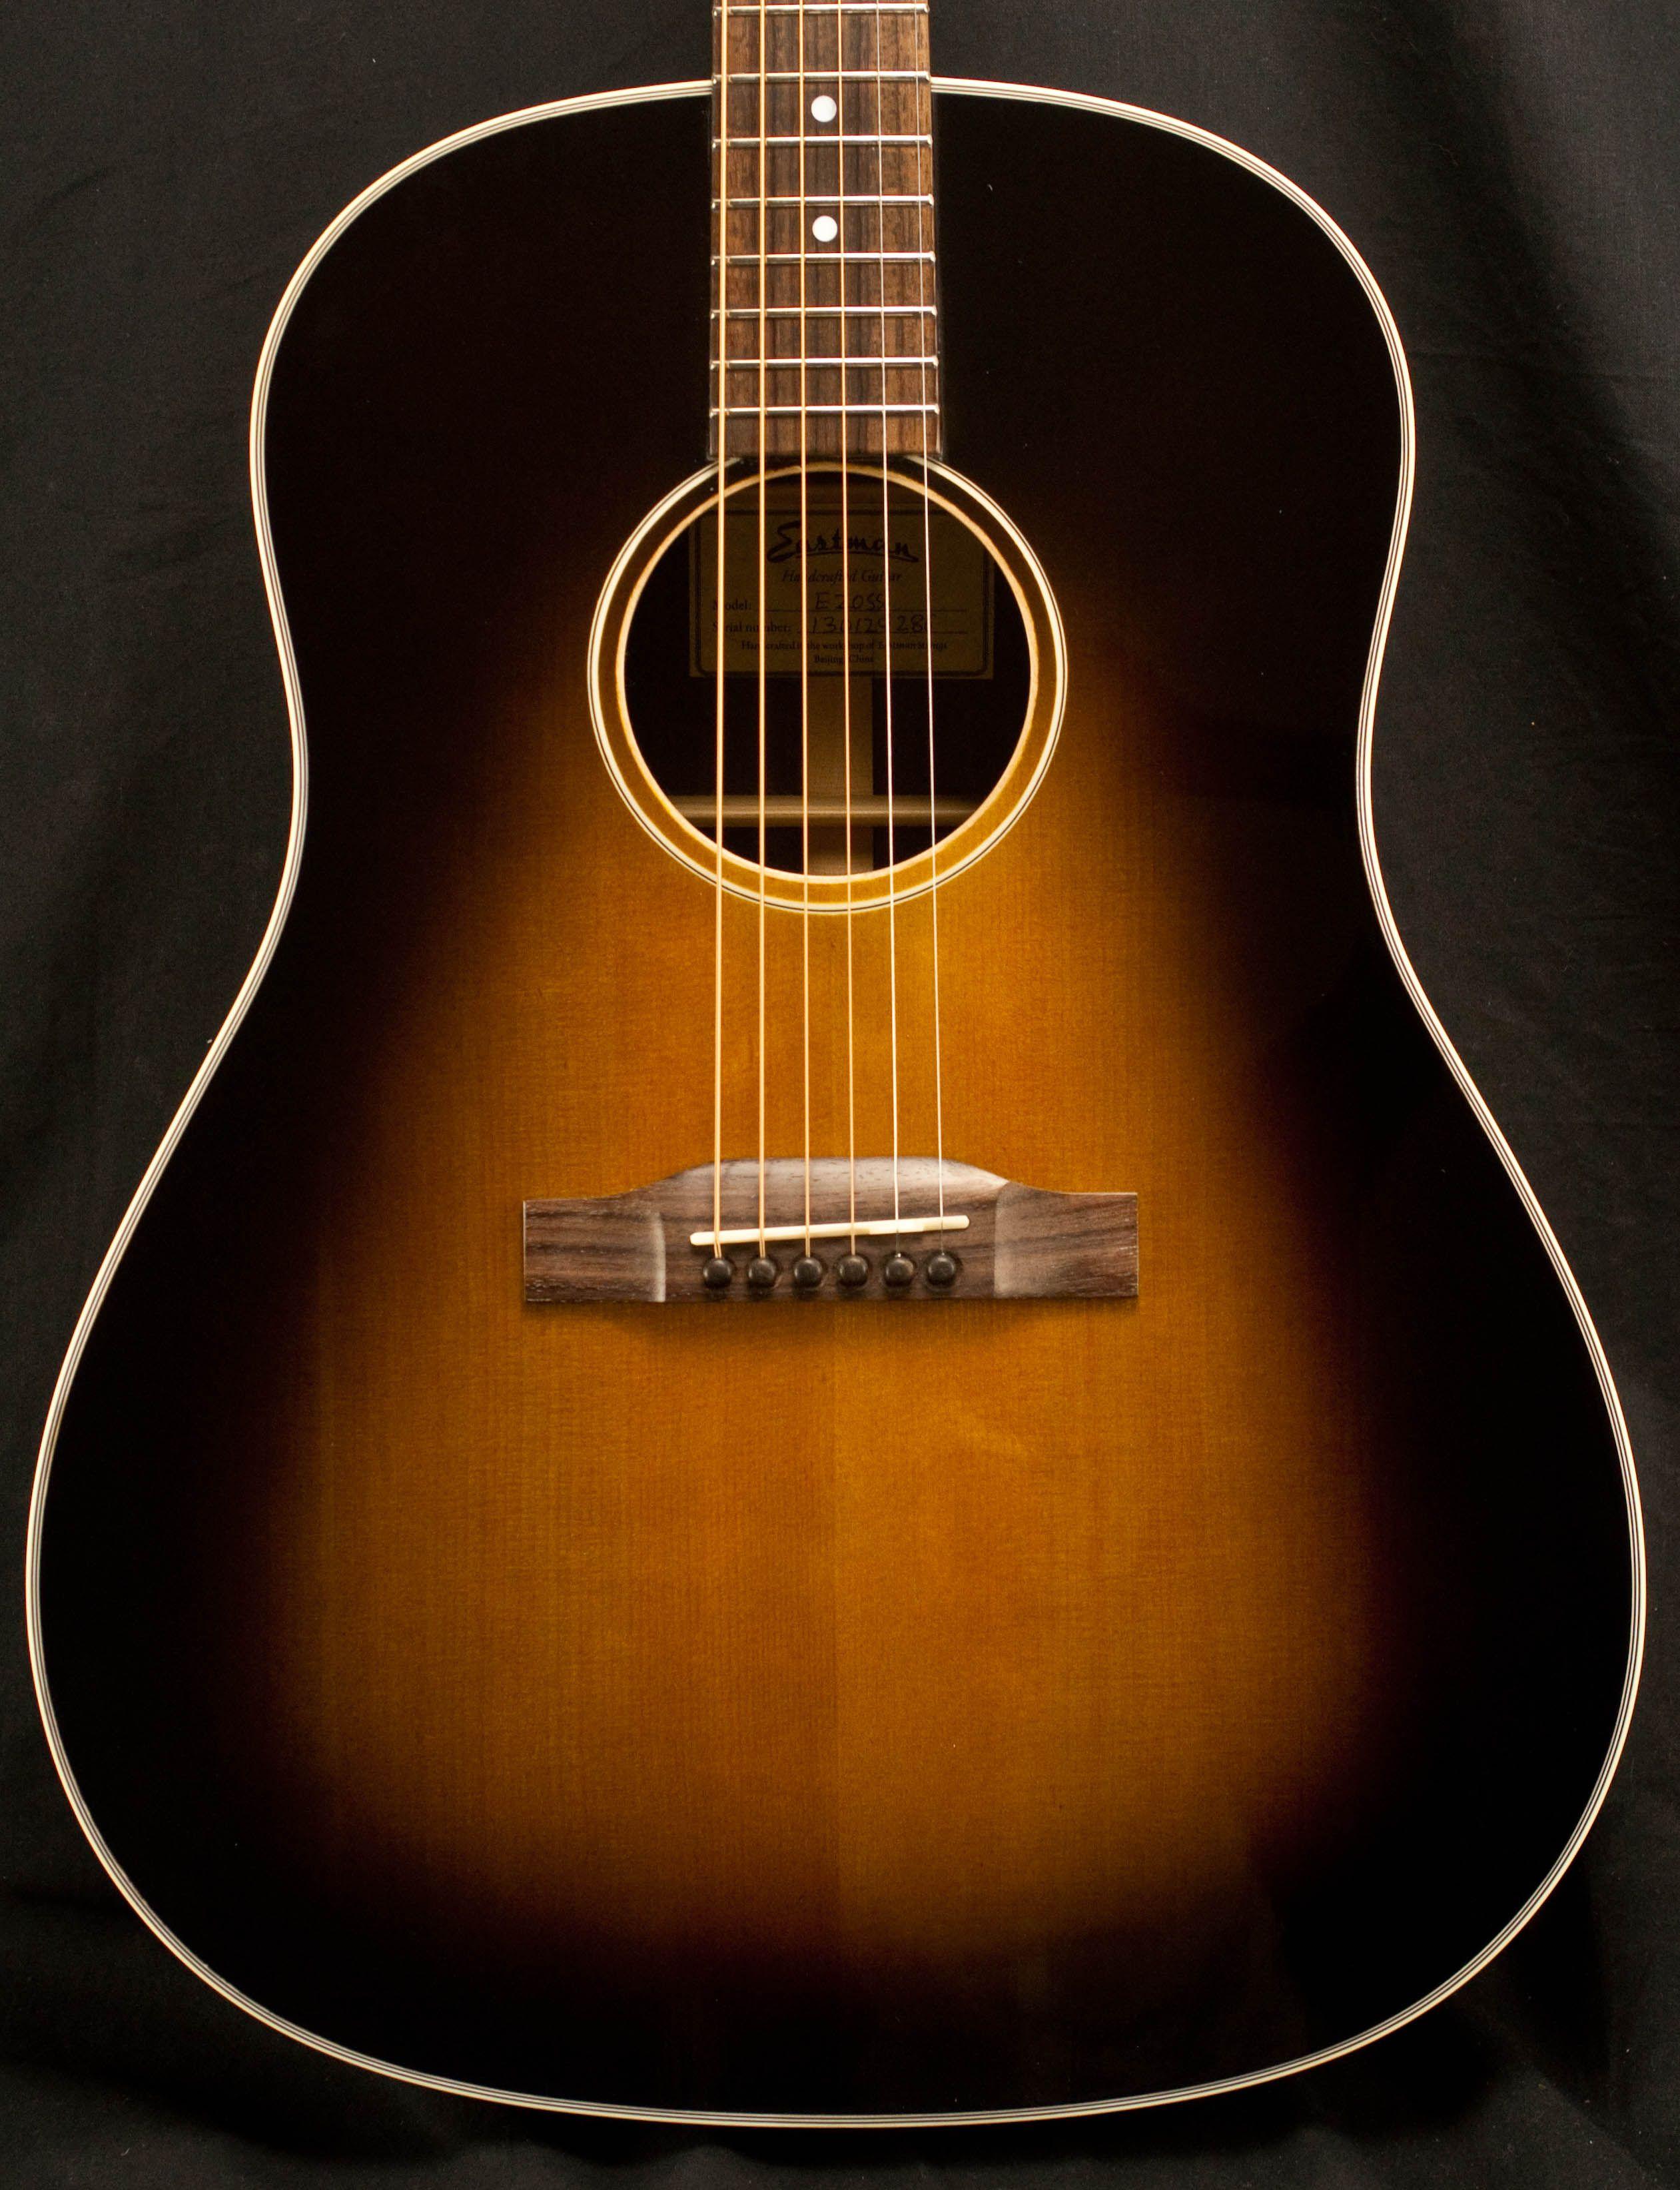 eastman e20 ss adirondack rosewood acoustic guitar 286 guitars stuff guitar acoustic. Black Bedroom Furniture Sets. Home Design Ideas